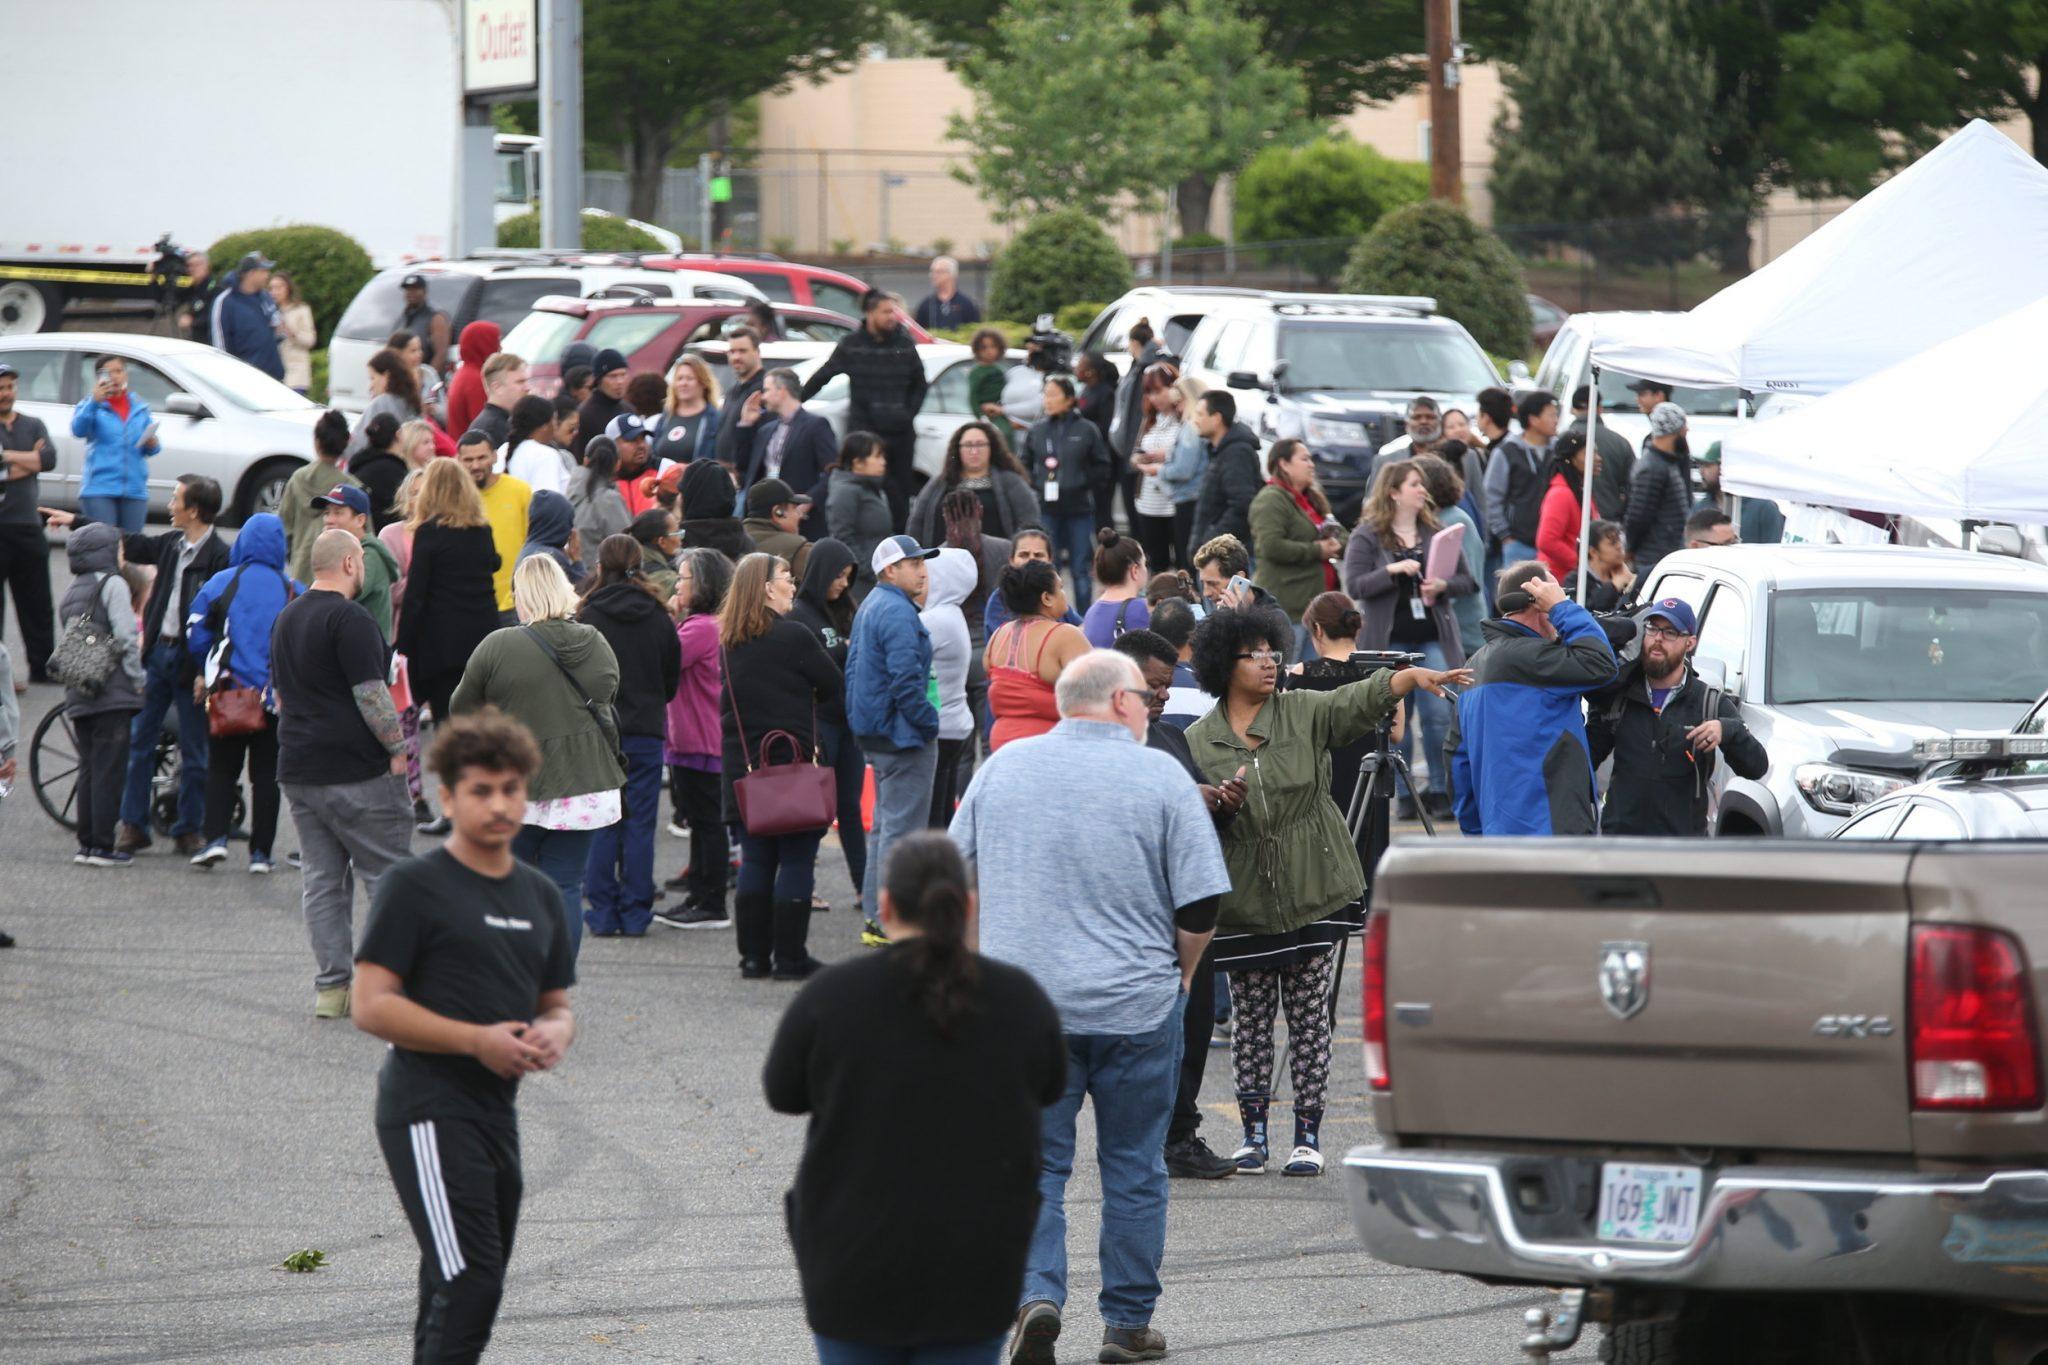 Police ID Teen Tackled After Bringing Gun to Oregon School